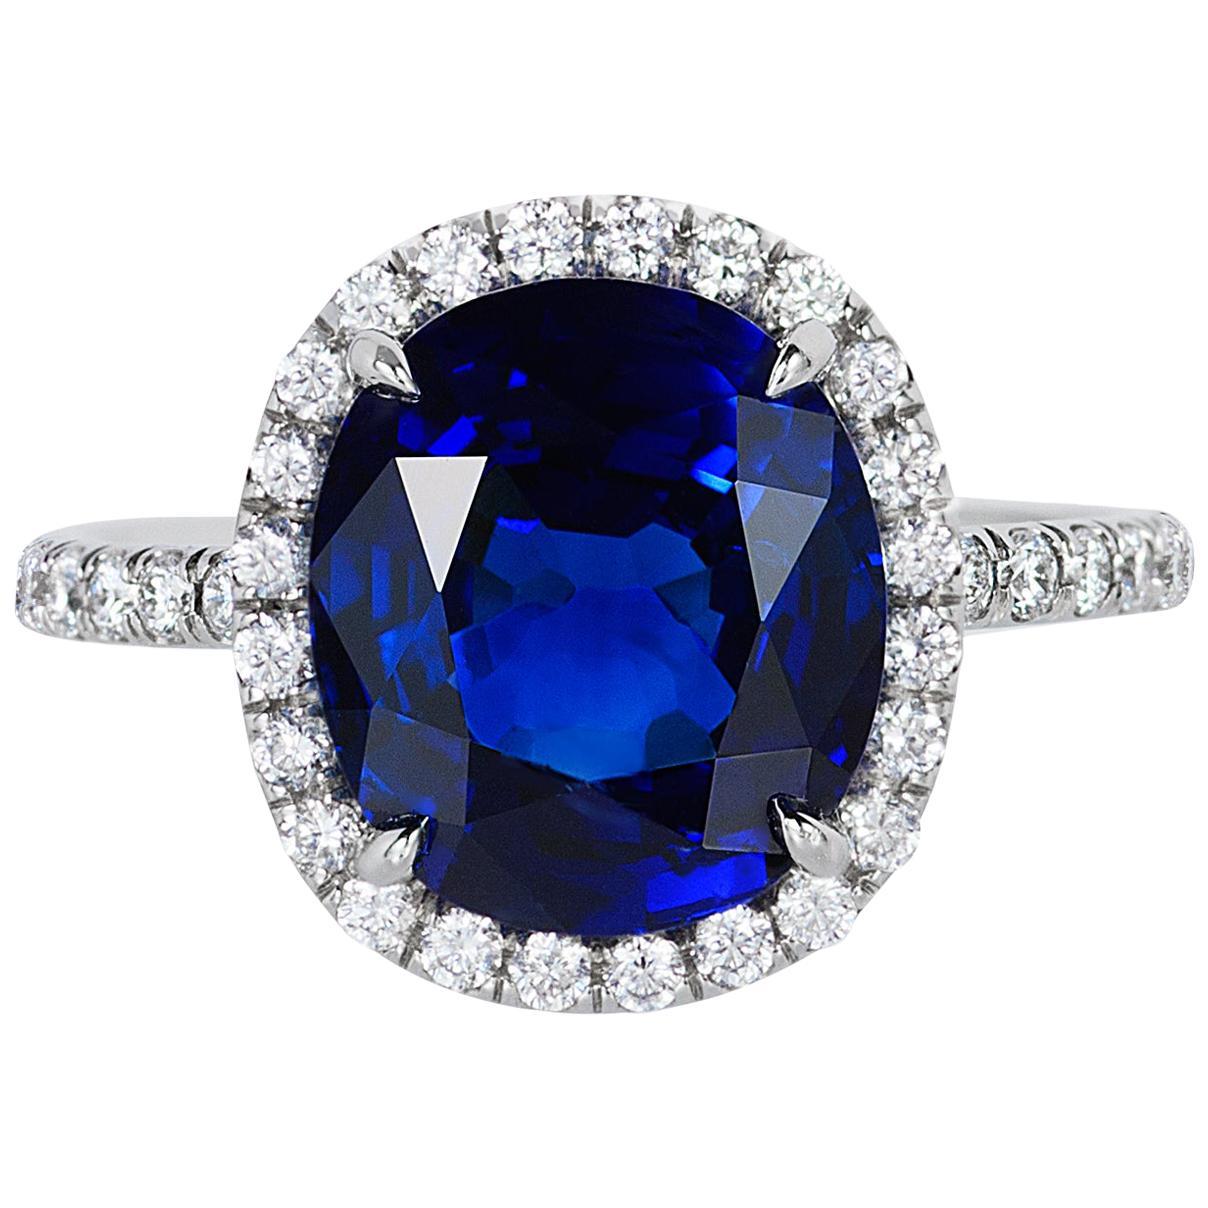 Andreoli CDC Certified 6.31 Carat Ceylon Blue Sapphire Diamond Platinum Ring